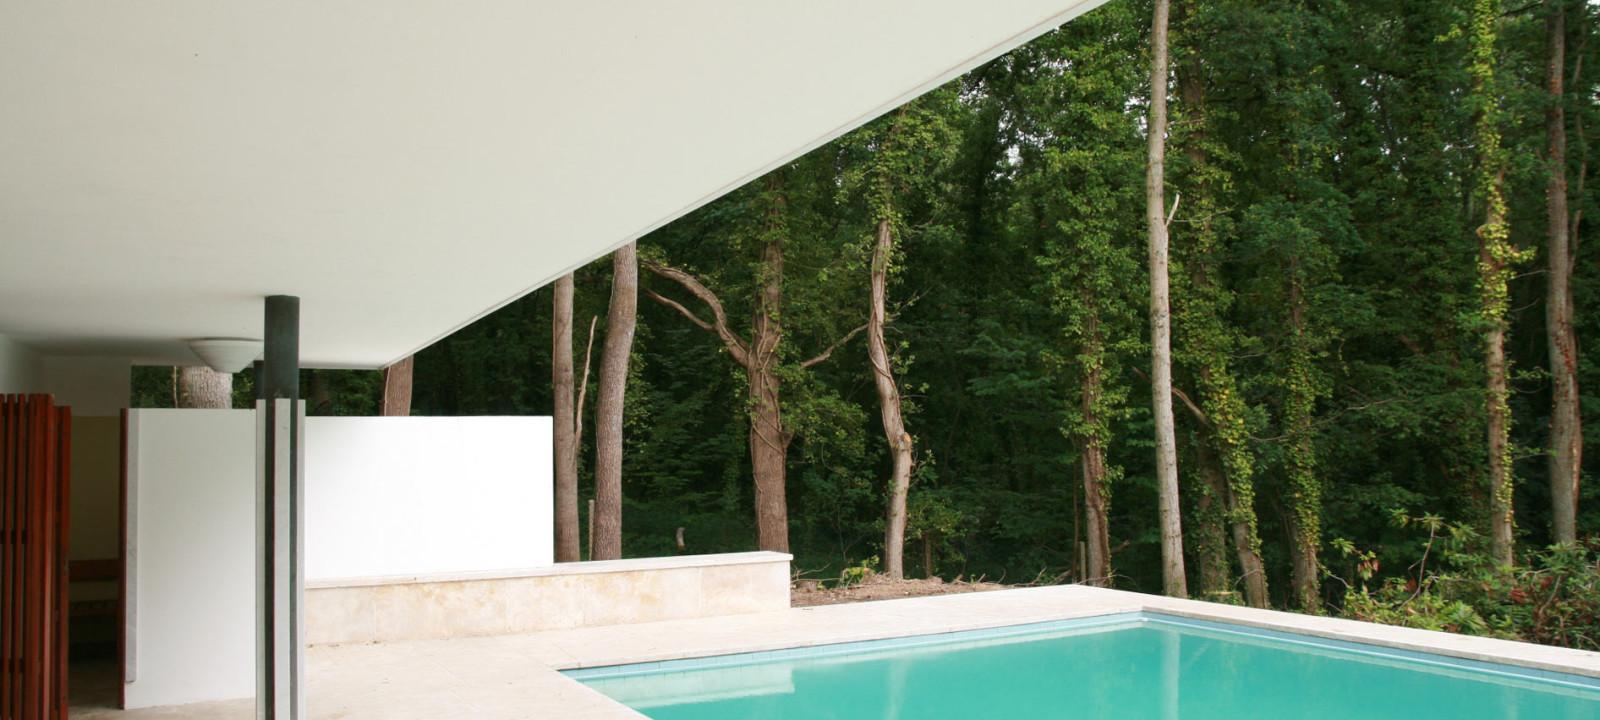 The Alvar Aalto Swimming Pool Maison Louis Carr 233 Chiara